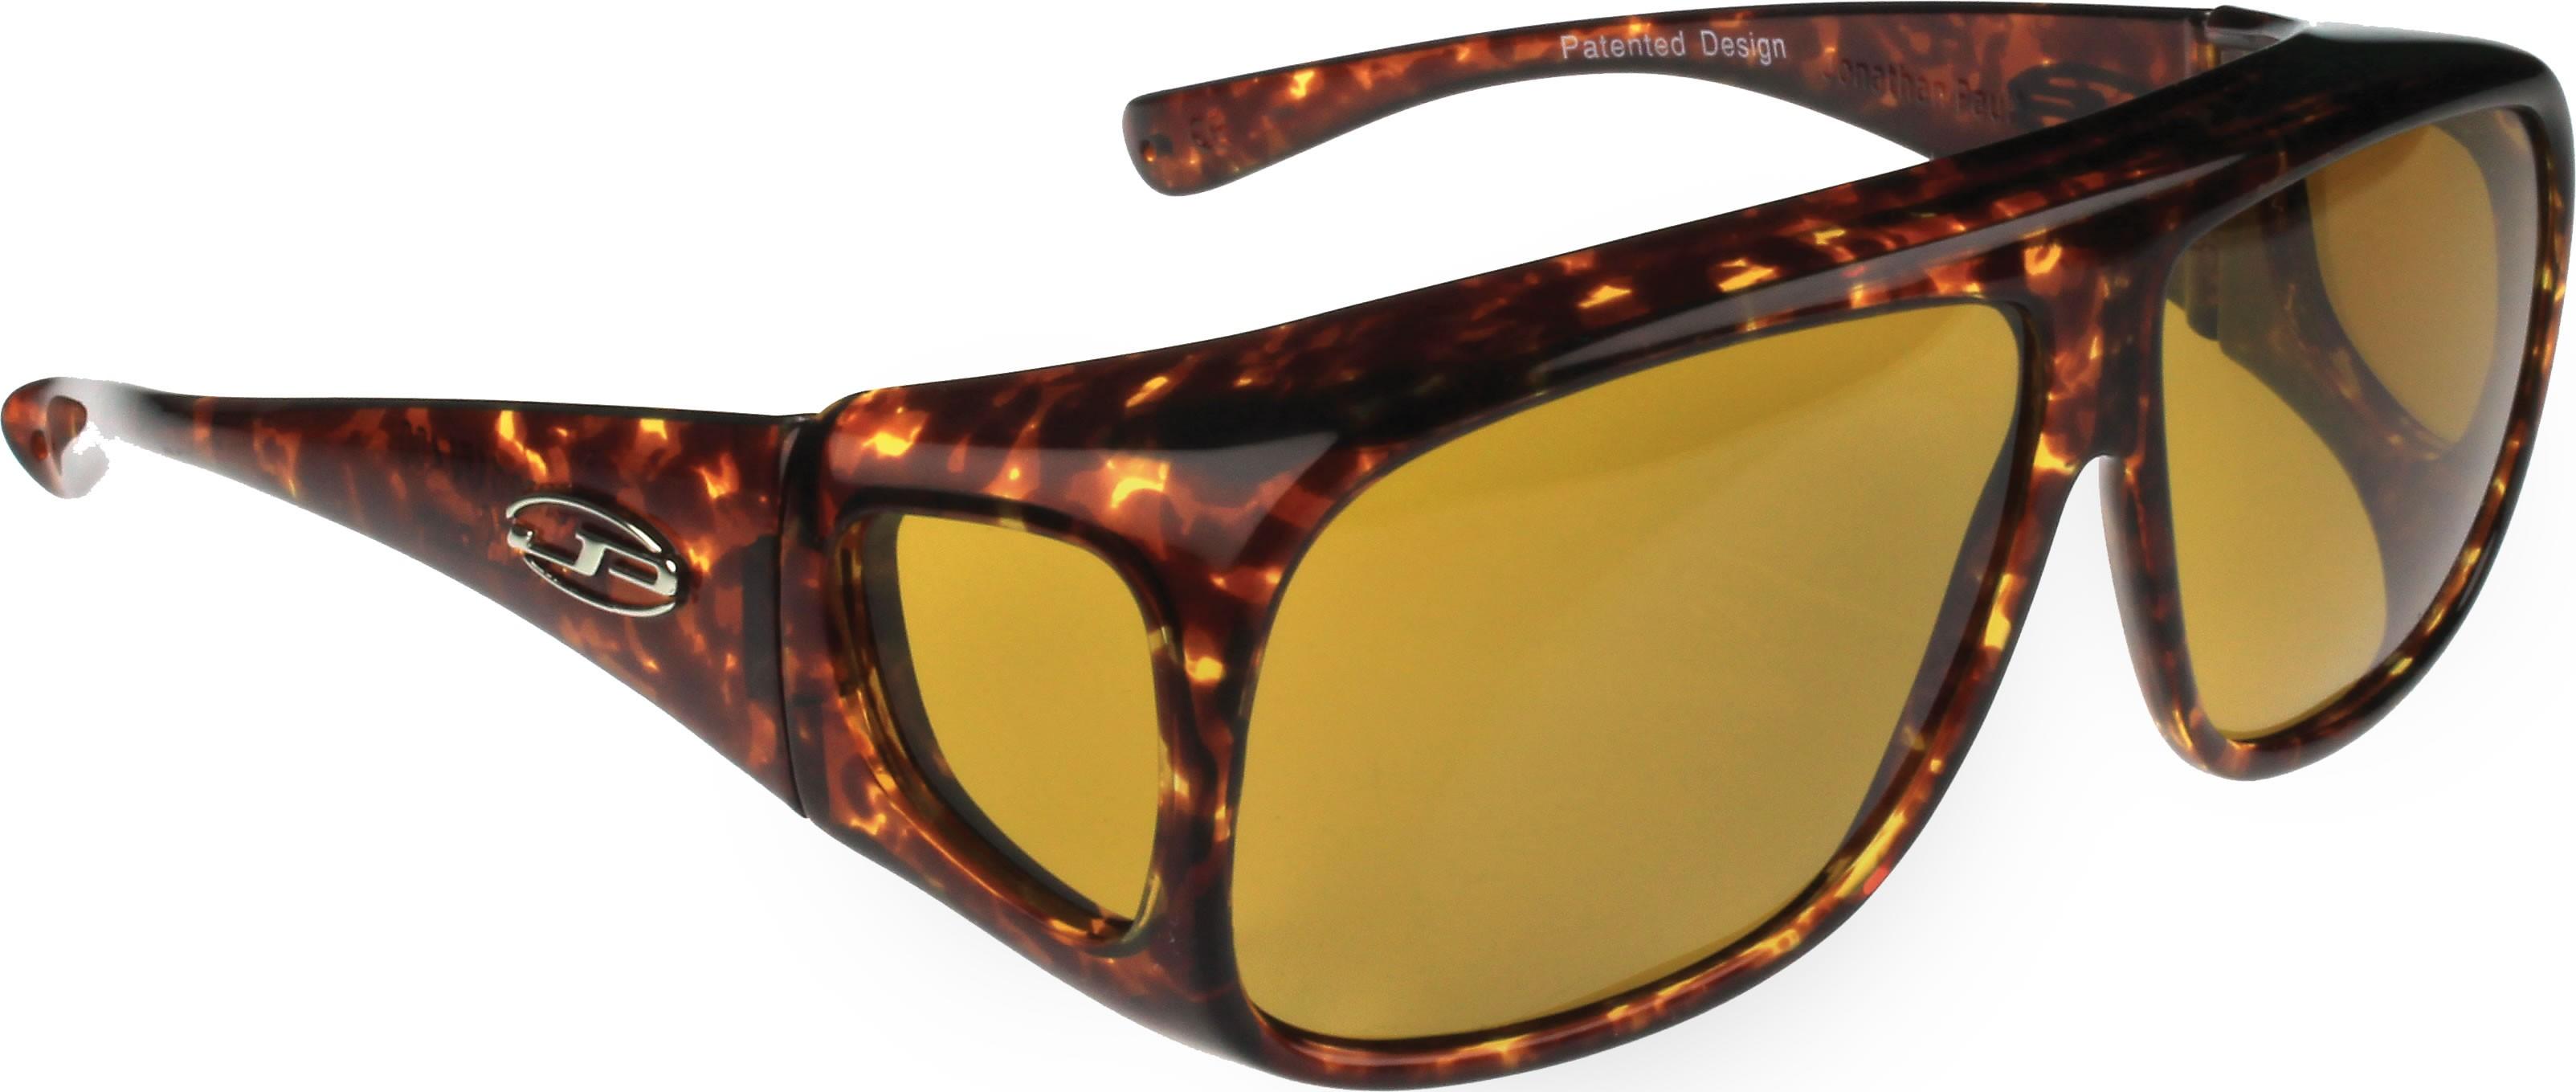 bdc630ef65d Amazon Fitovers Polarized Sunglasses